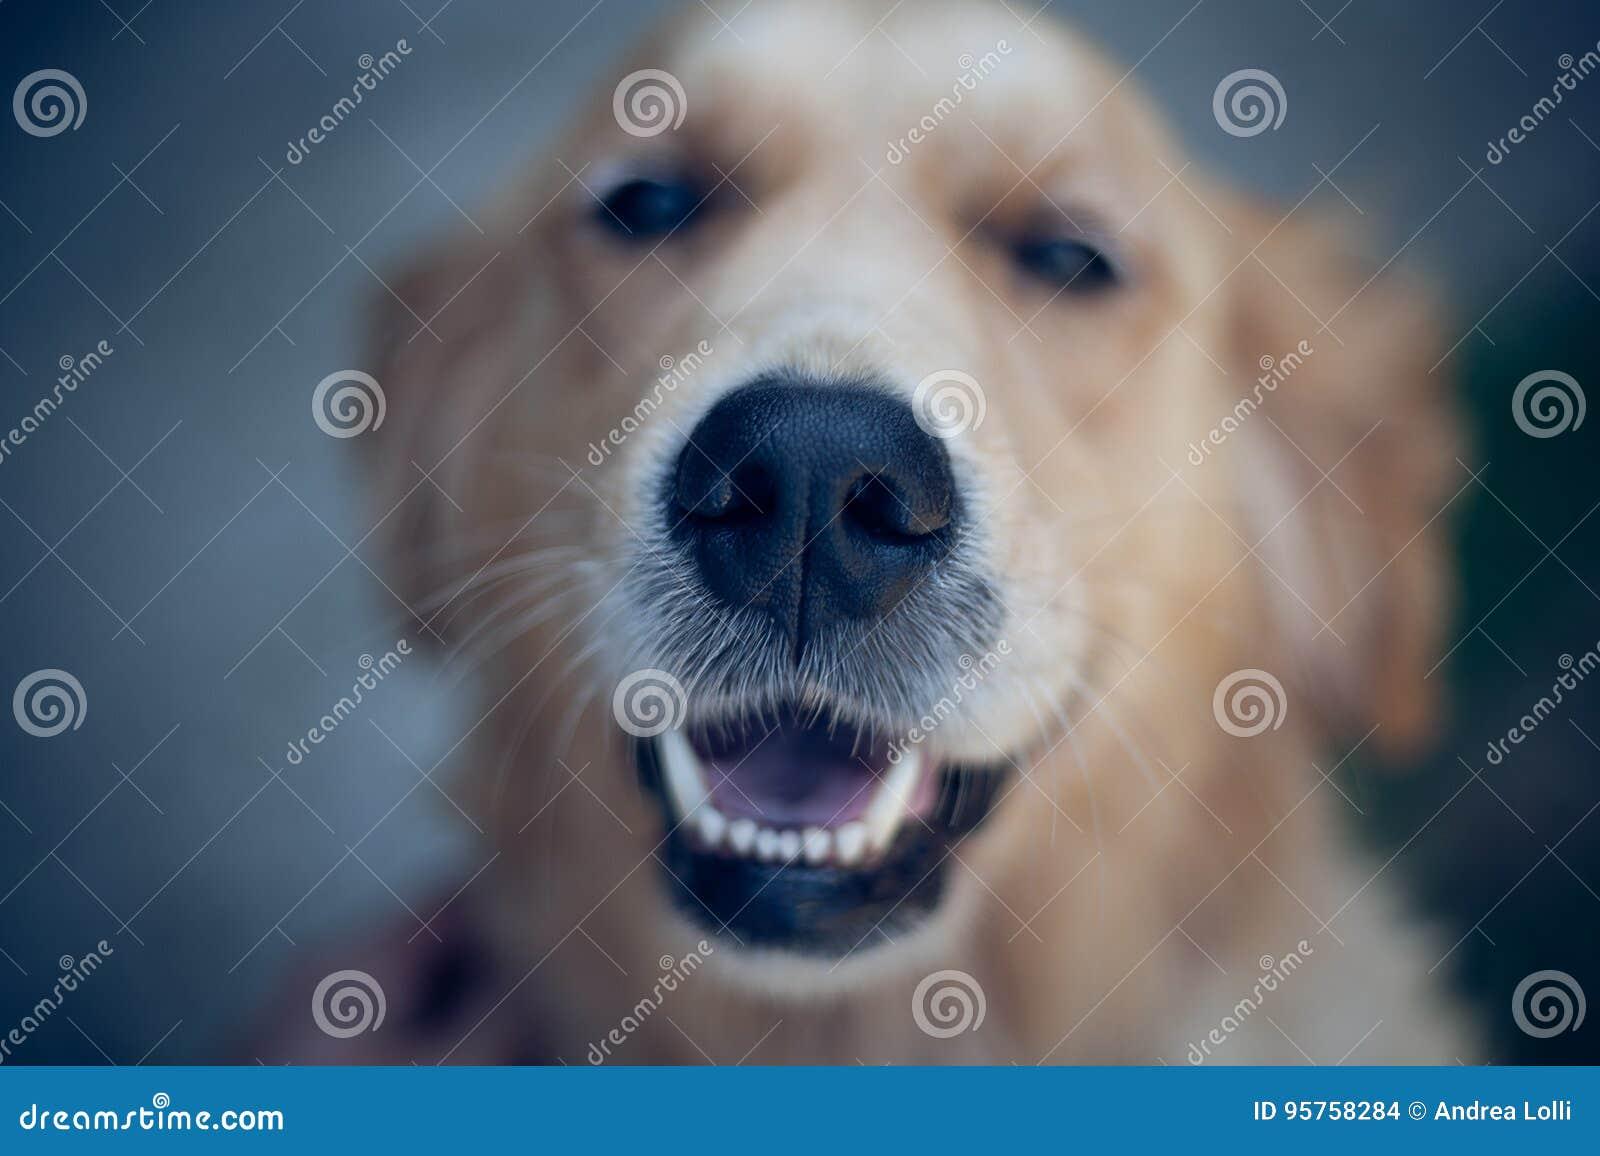 Smiling Golden Retriever Dog Eyes Close Up Focus Portrait White